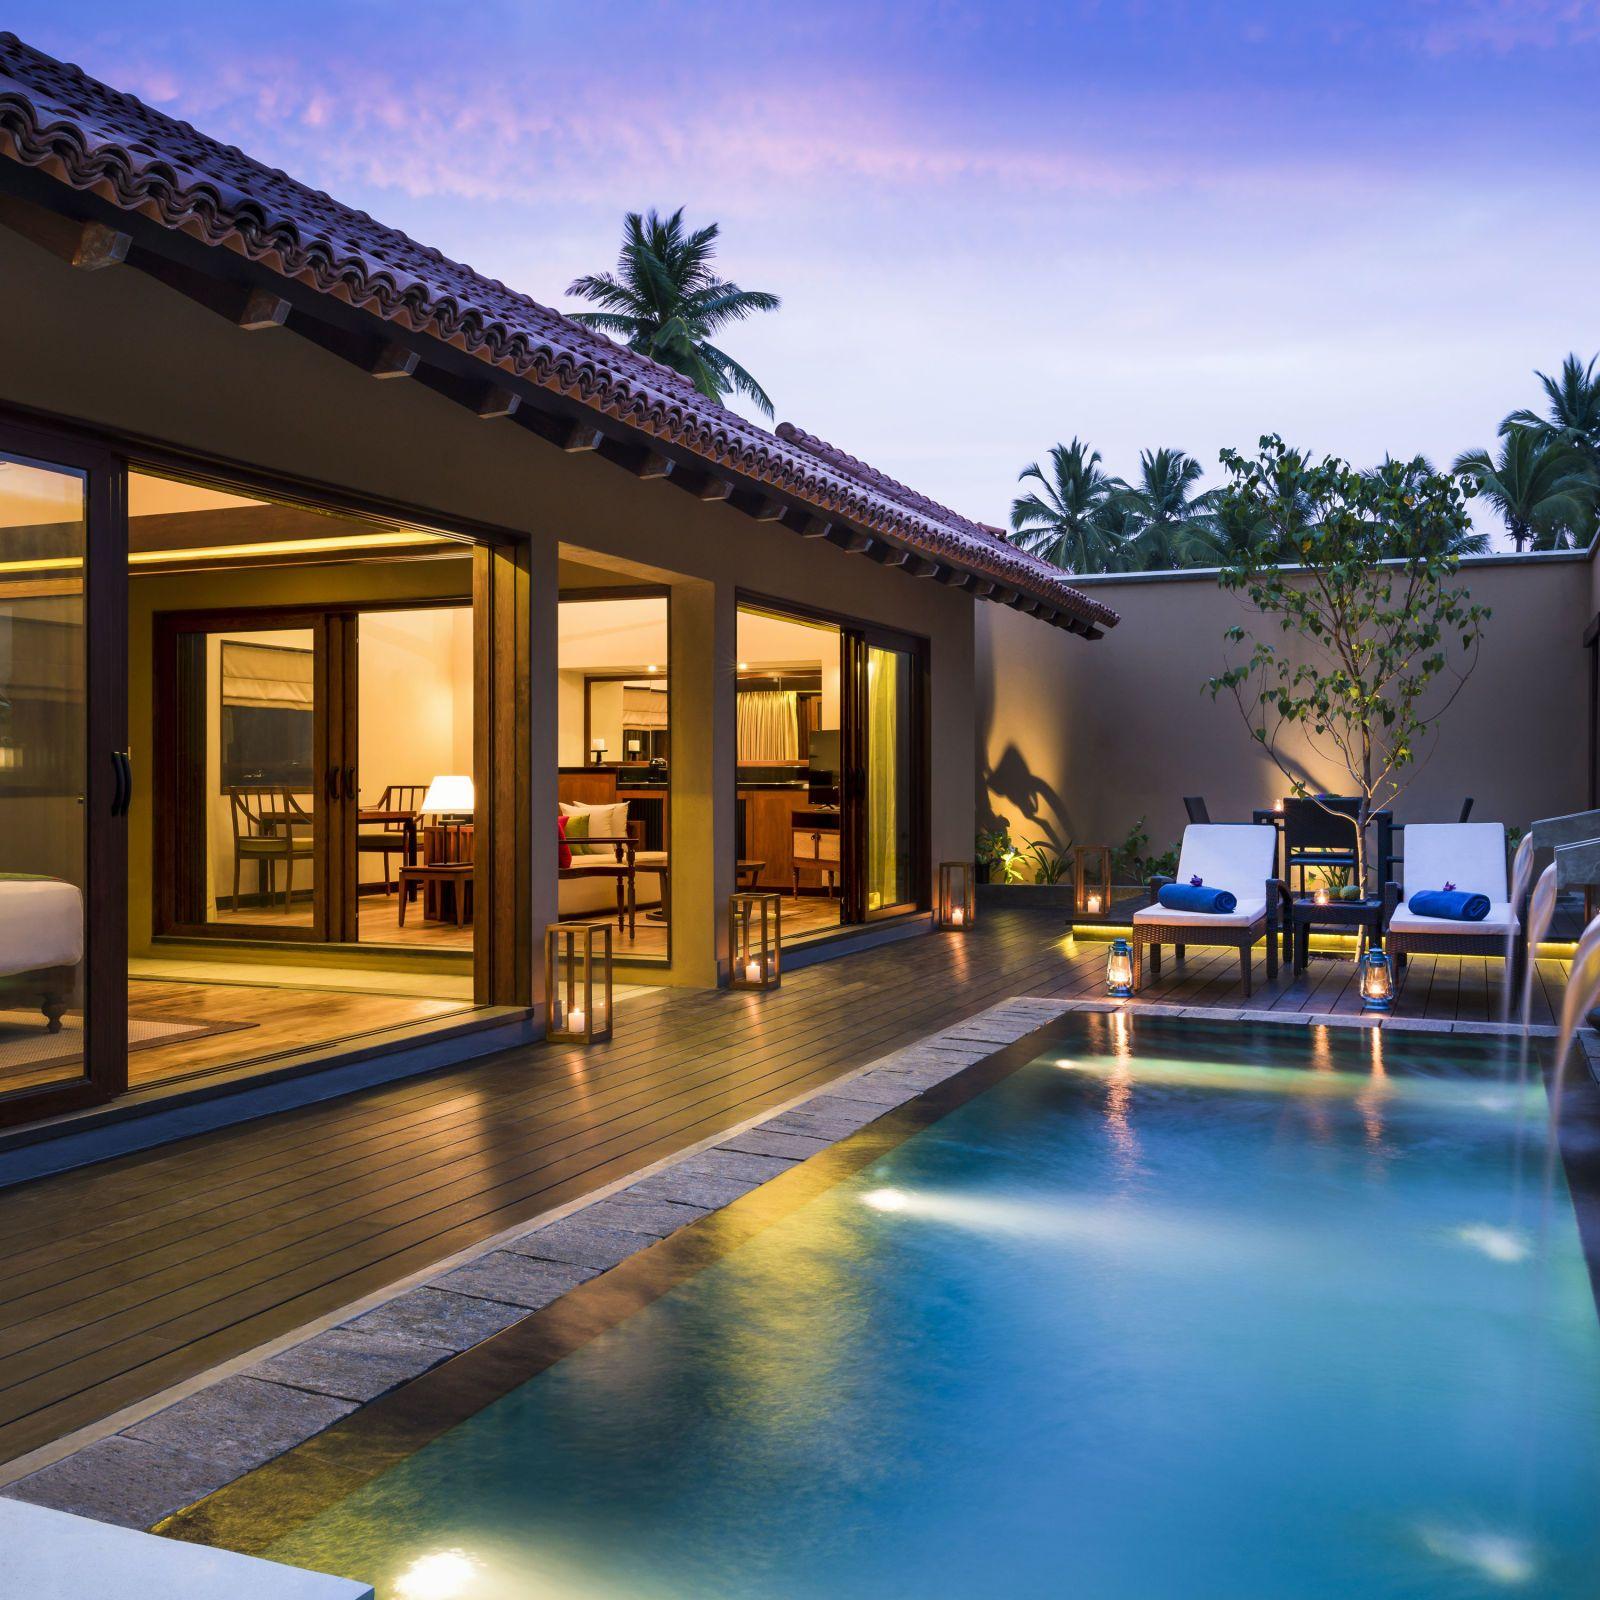 Anantara Kalutara Resort, Sri Lanka | Sri lanka, Resorts and Hotel ...